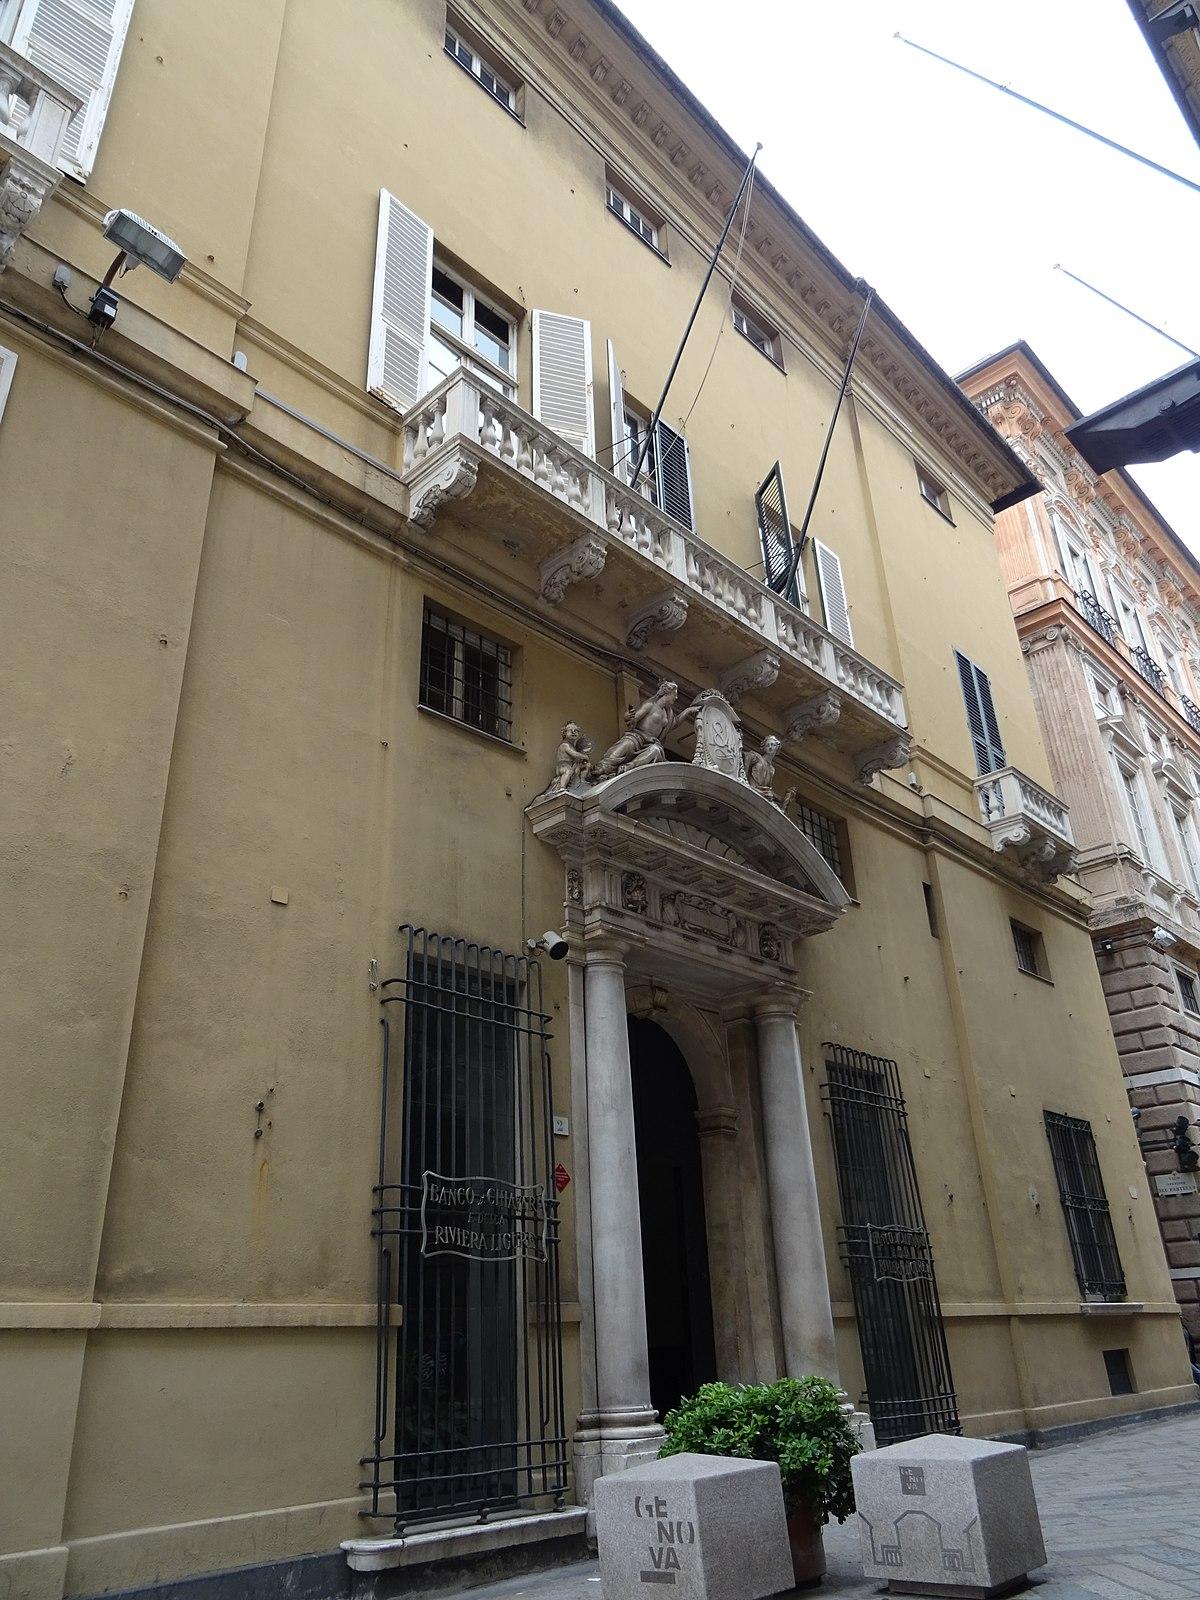 L Arte Di Salire Chiavari palazzo pantaleo spinola - wikipedia